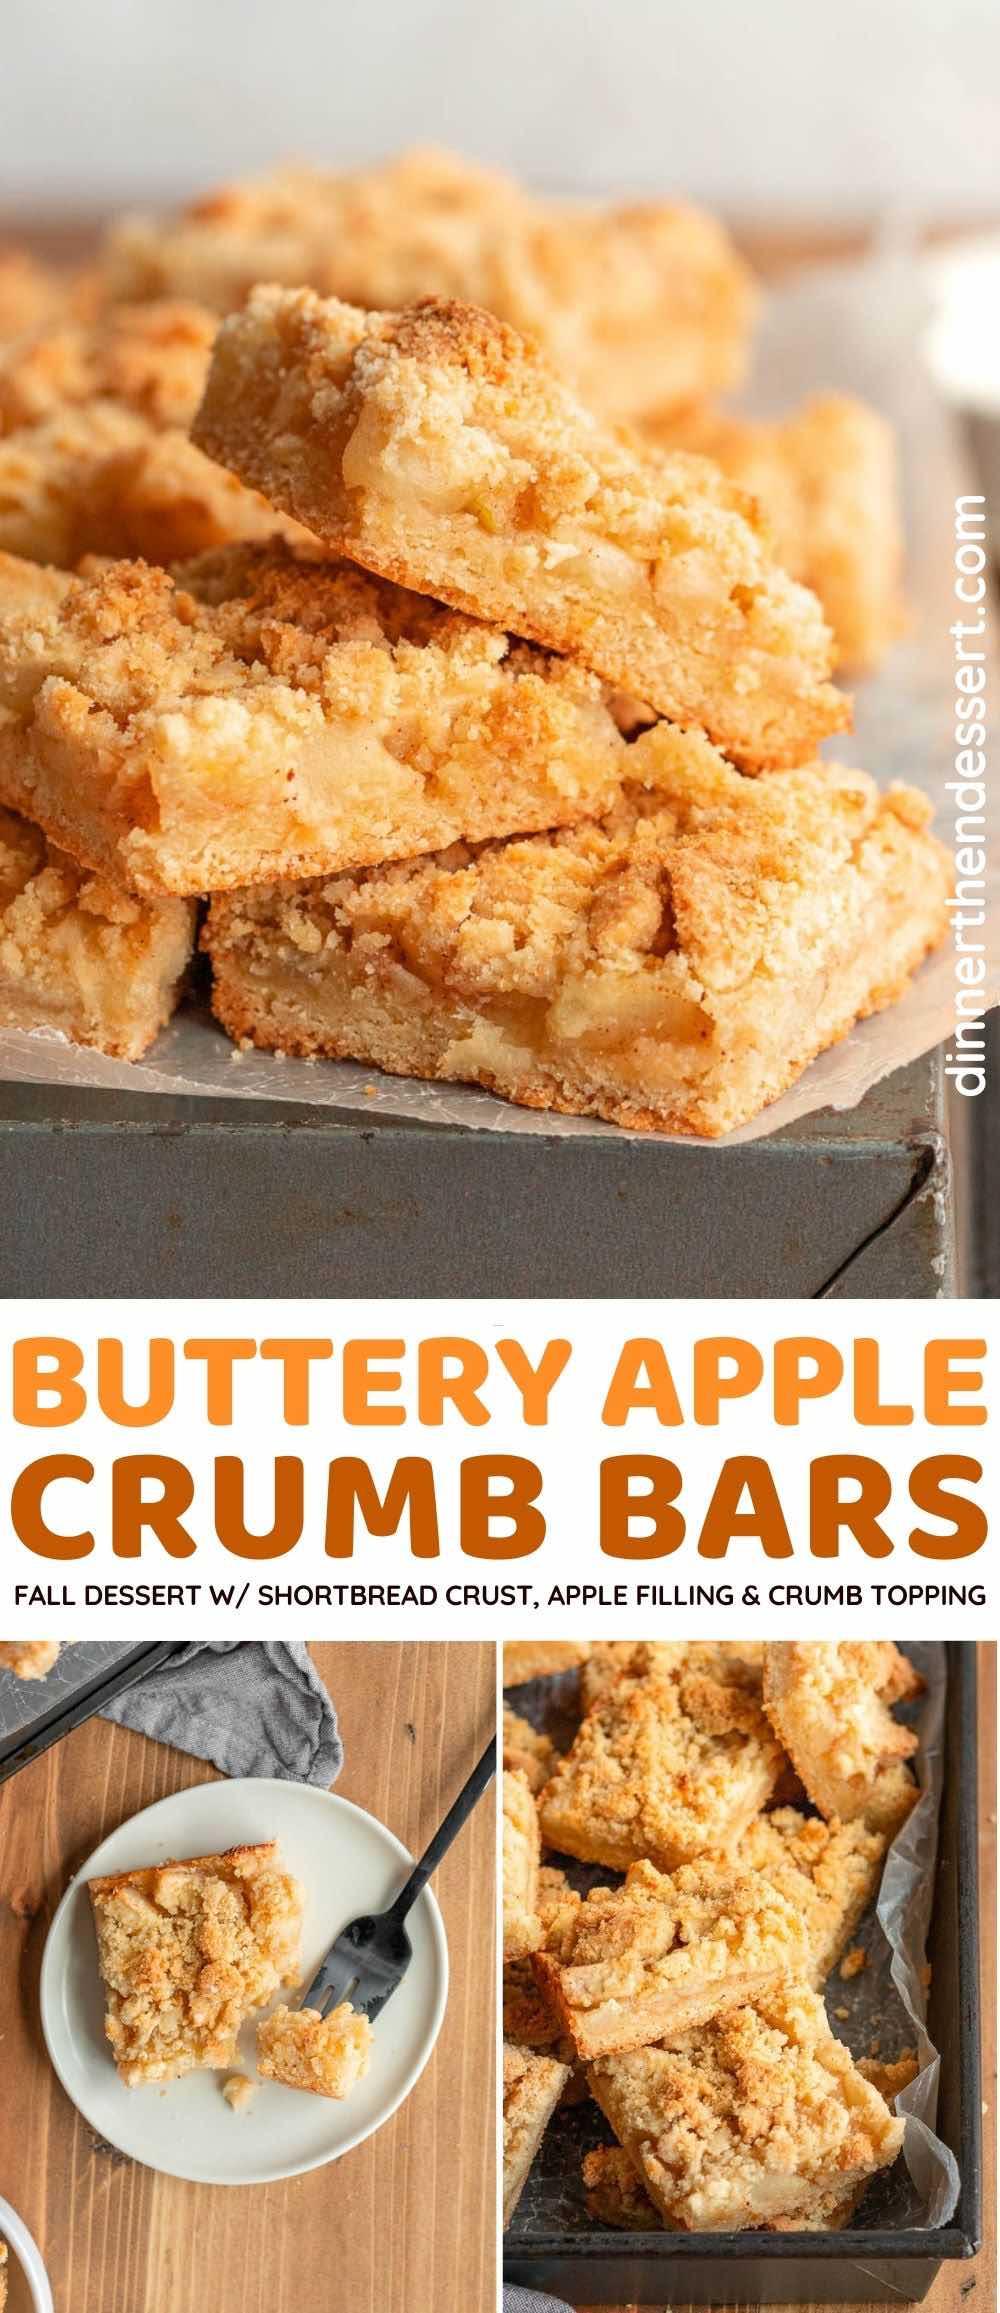 Apple Crumb Bars collage